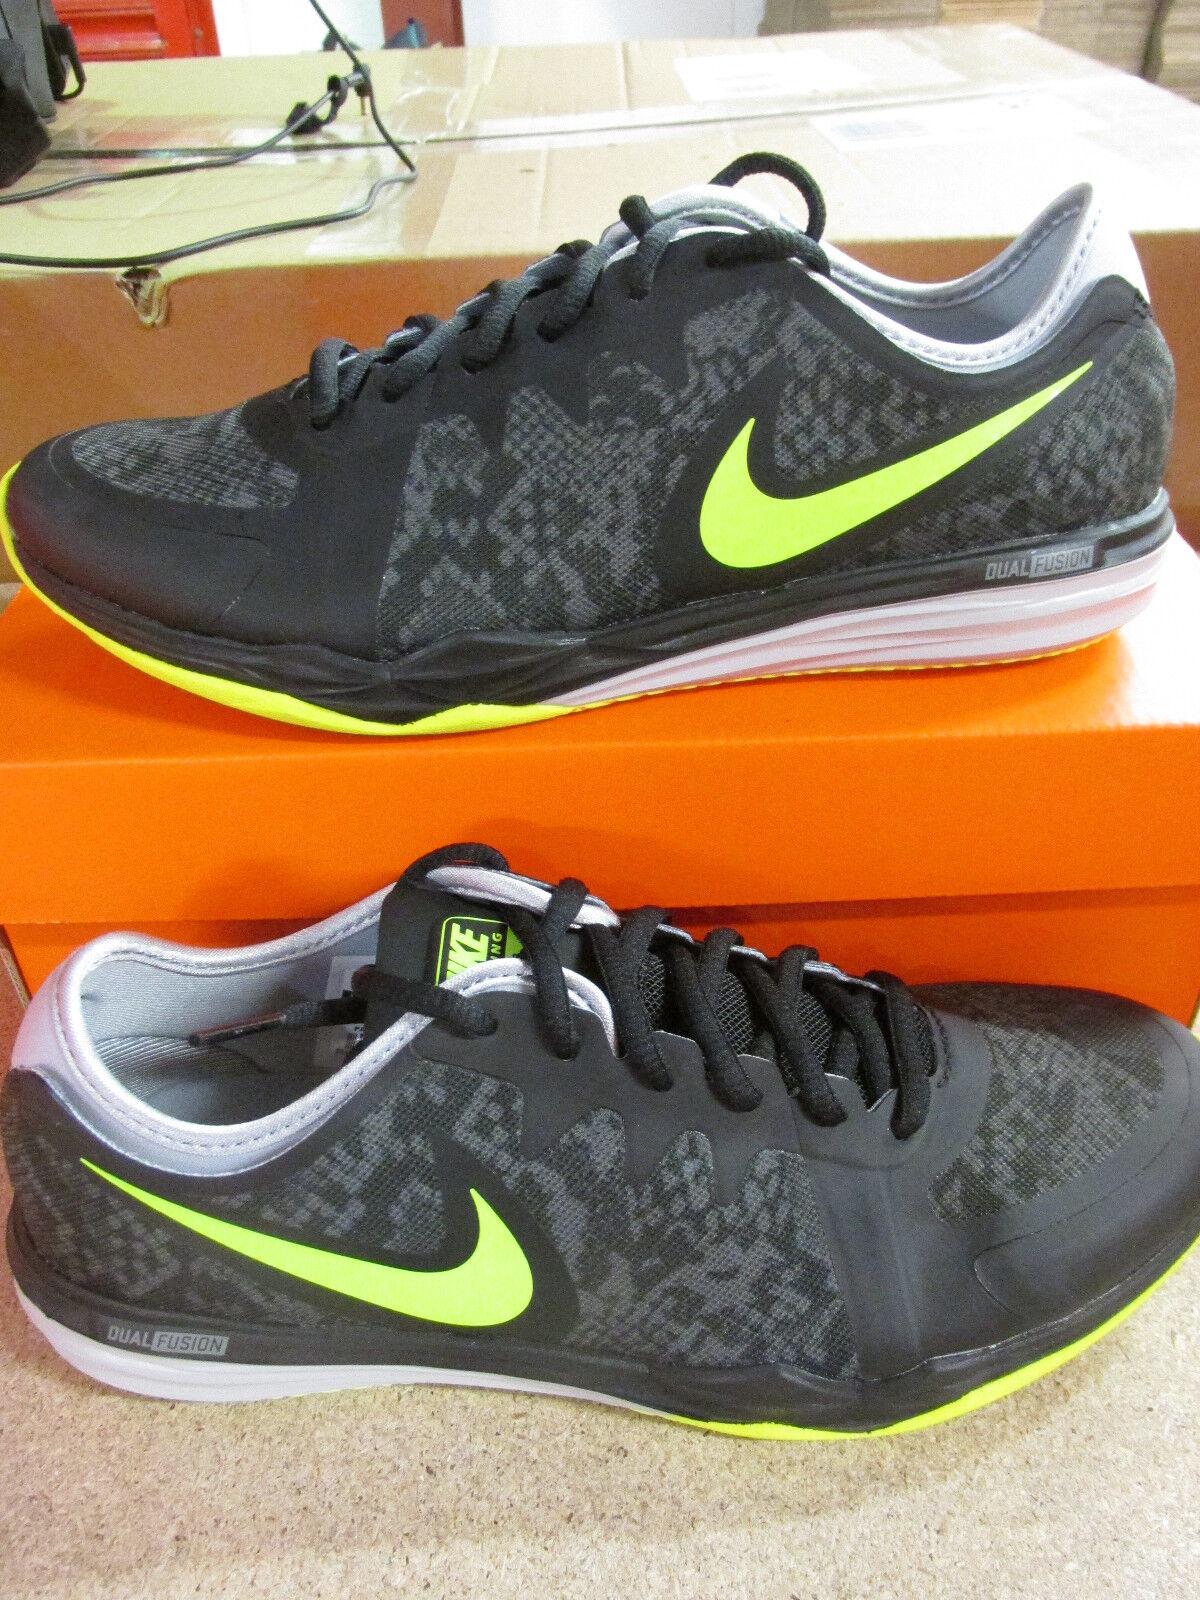 Nike Damen Laufschuhe Dual Fusion Tr 3 Aufdruck Laufschuhe Damen 704941 011 Turnschuhe c9d9d5